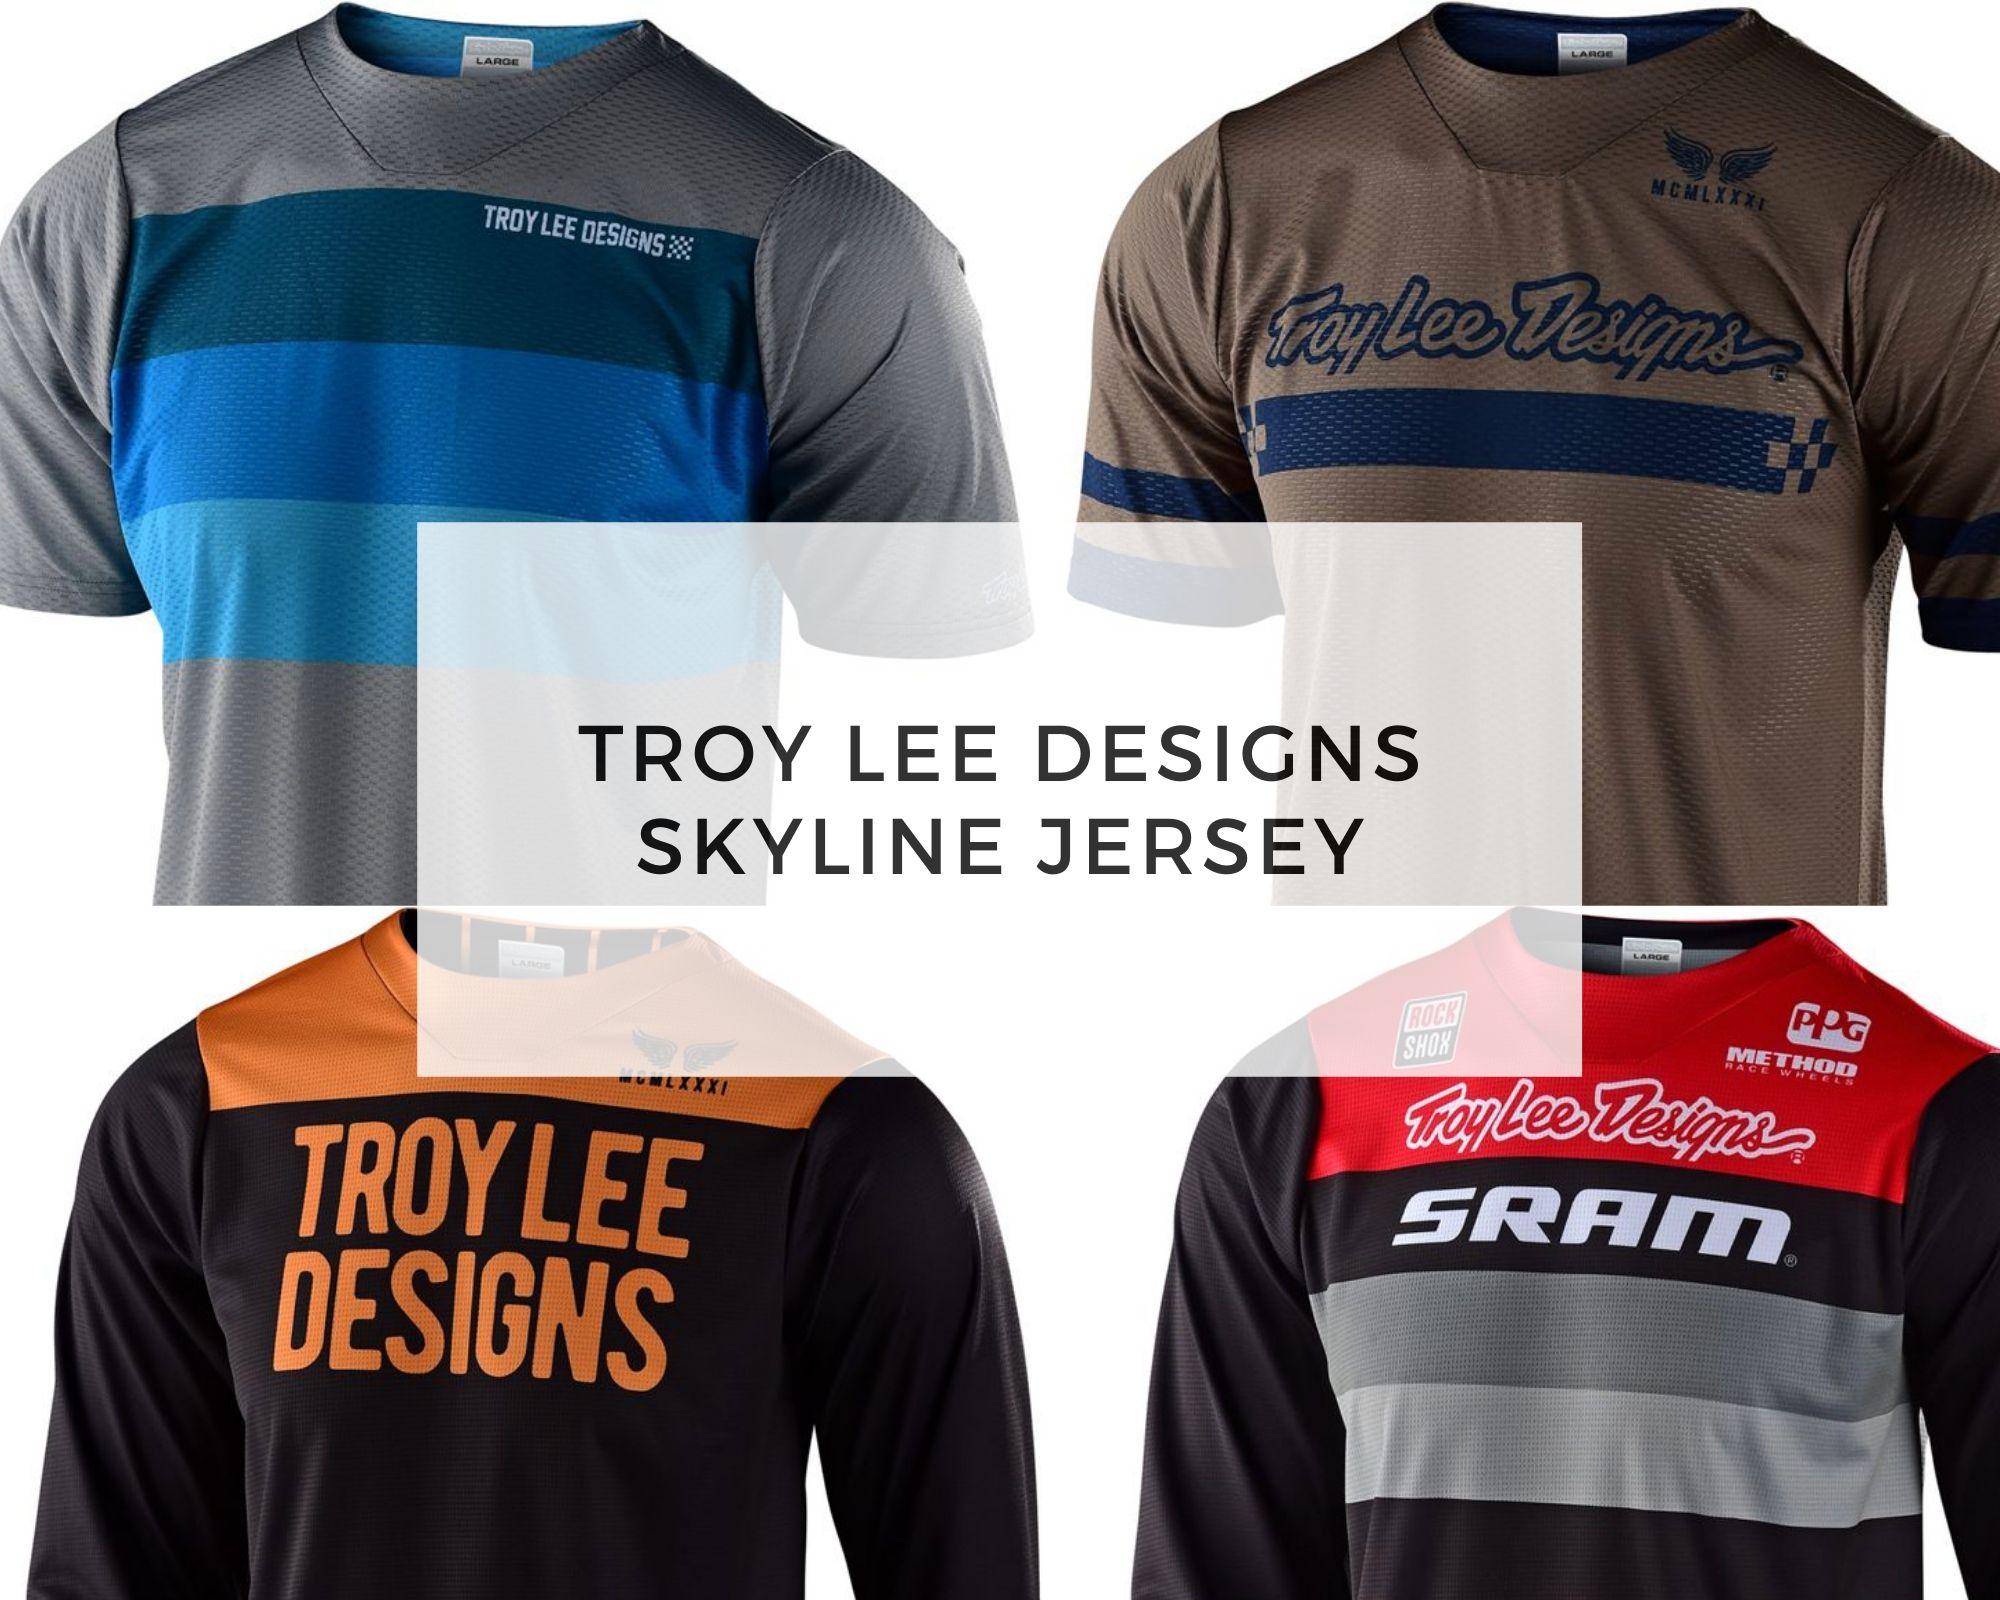 Troy Lee Designs jersey - Skyline jersey cover